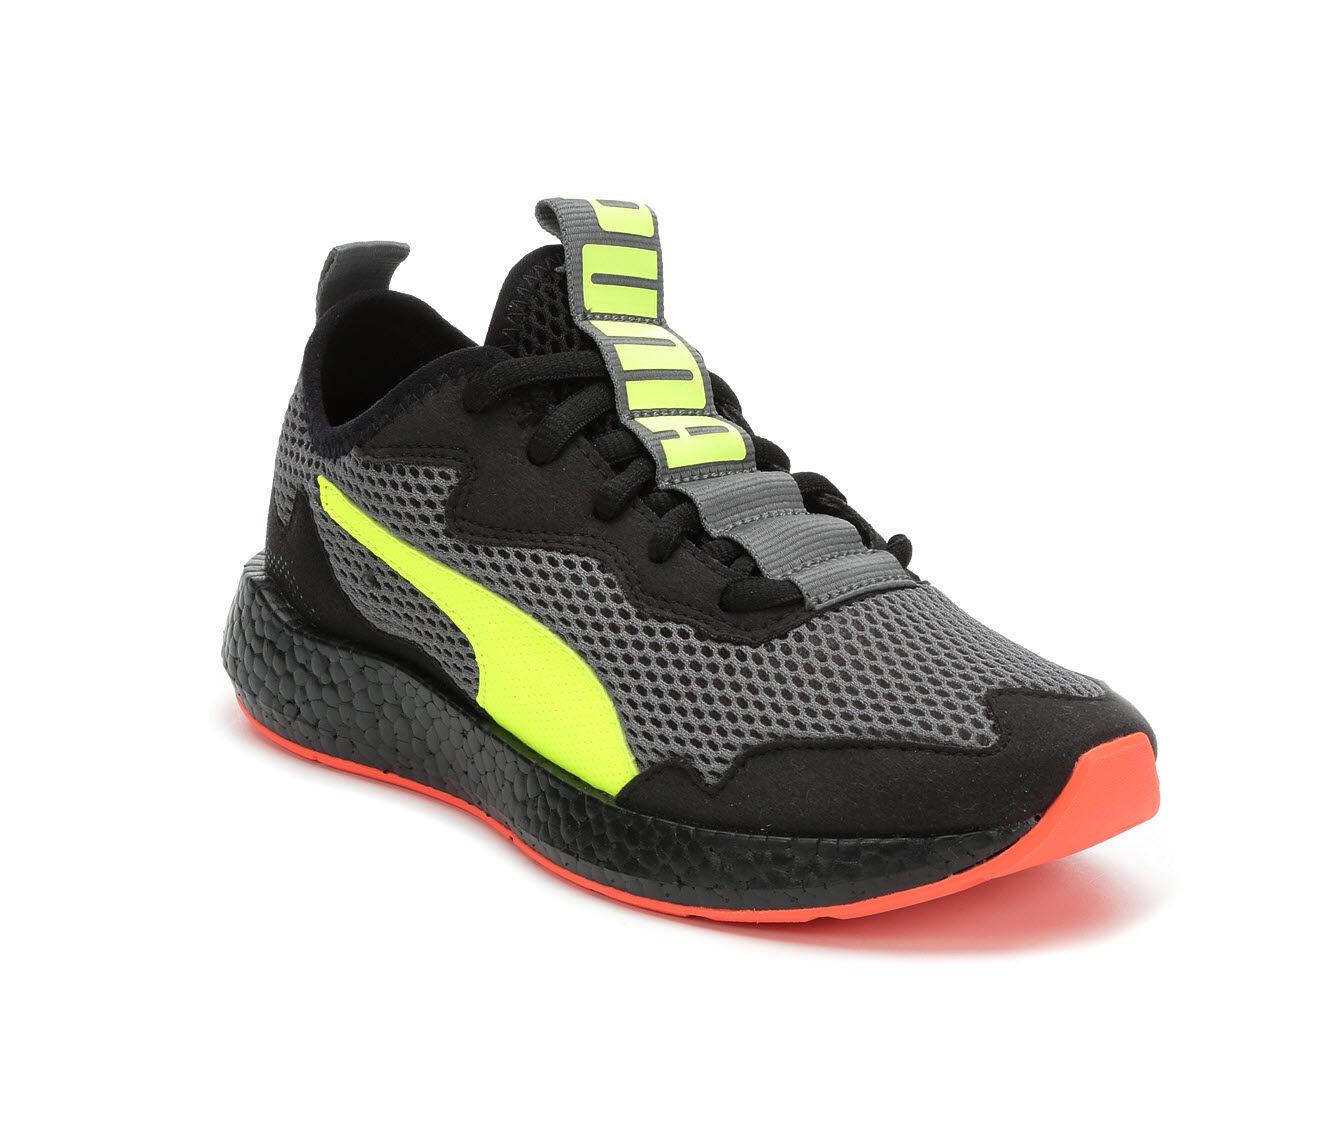 Puma Enzo Shoes Discount Cheap Puma Shoes Boys Black